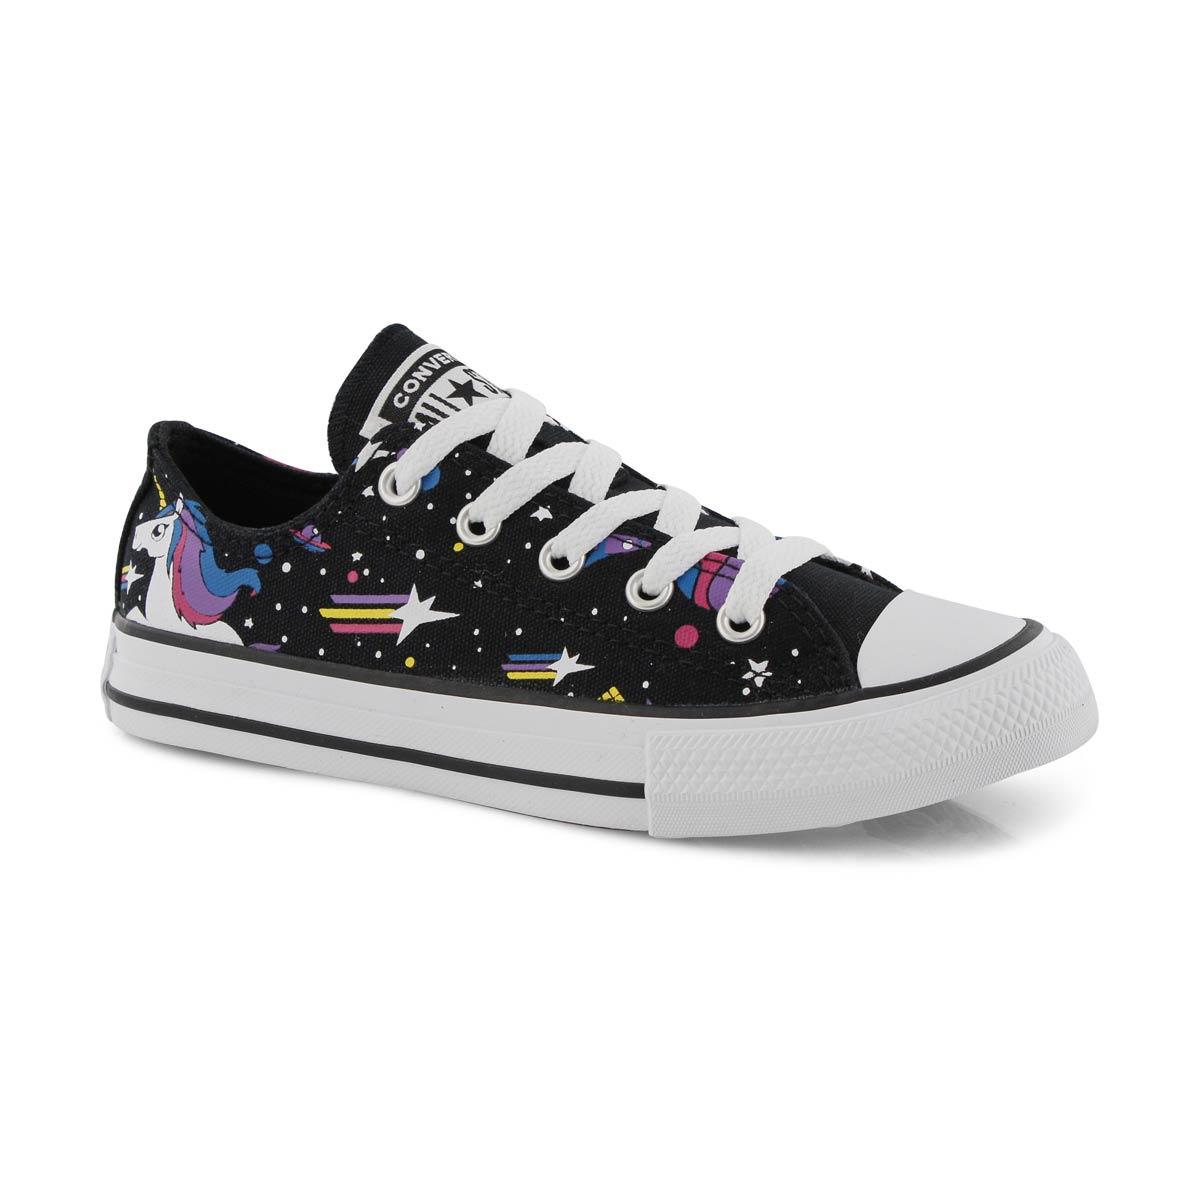 Grls CTAS Unicorns blk/pnk/wht sneaker